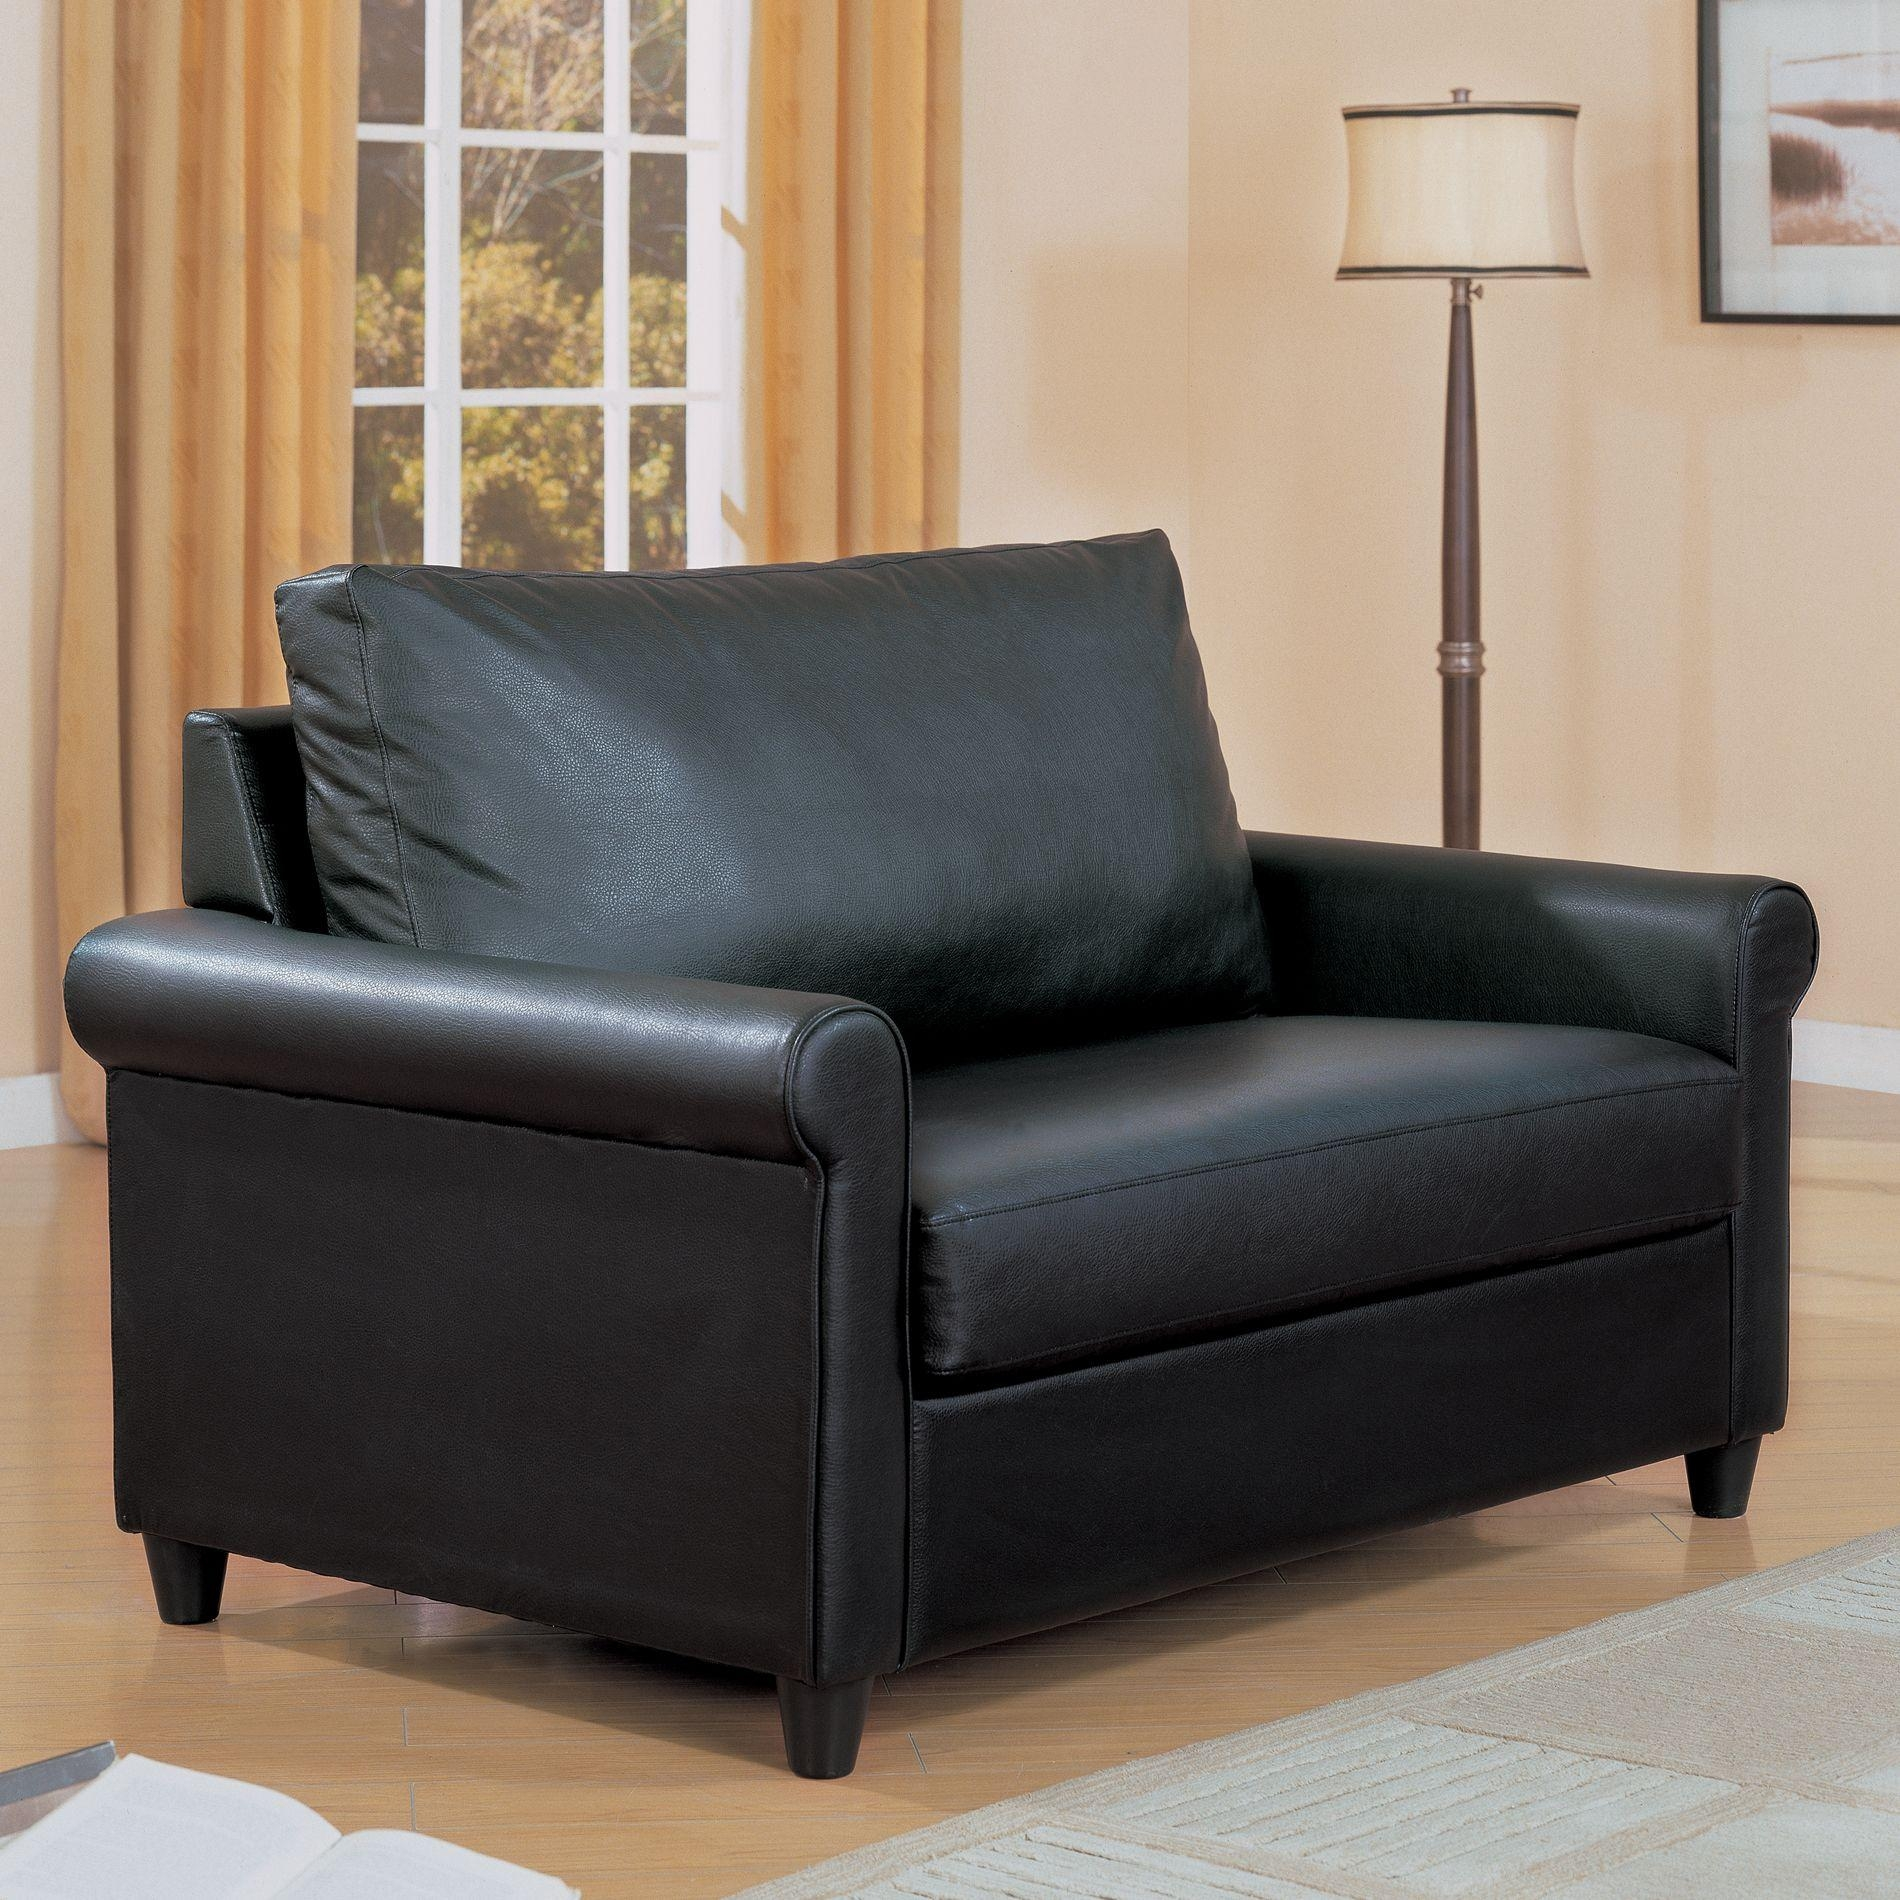 Sofas: Macys Furniture Sofa Bed | Sleeper Sofa Full Size | Macys For Full Size Sofa Beds (View 15 of 20)